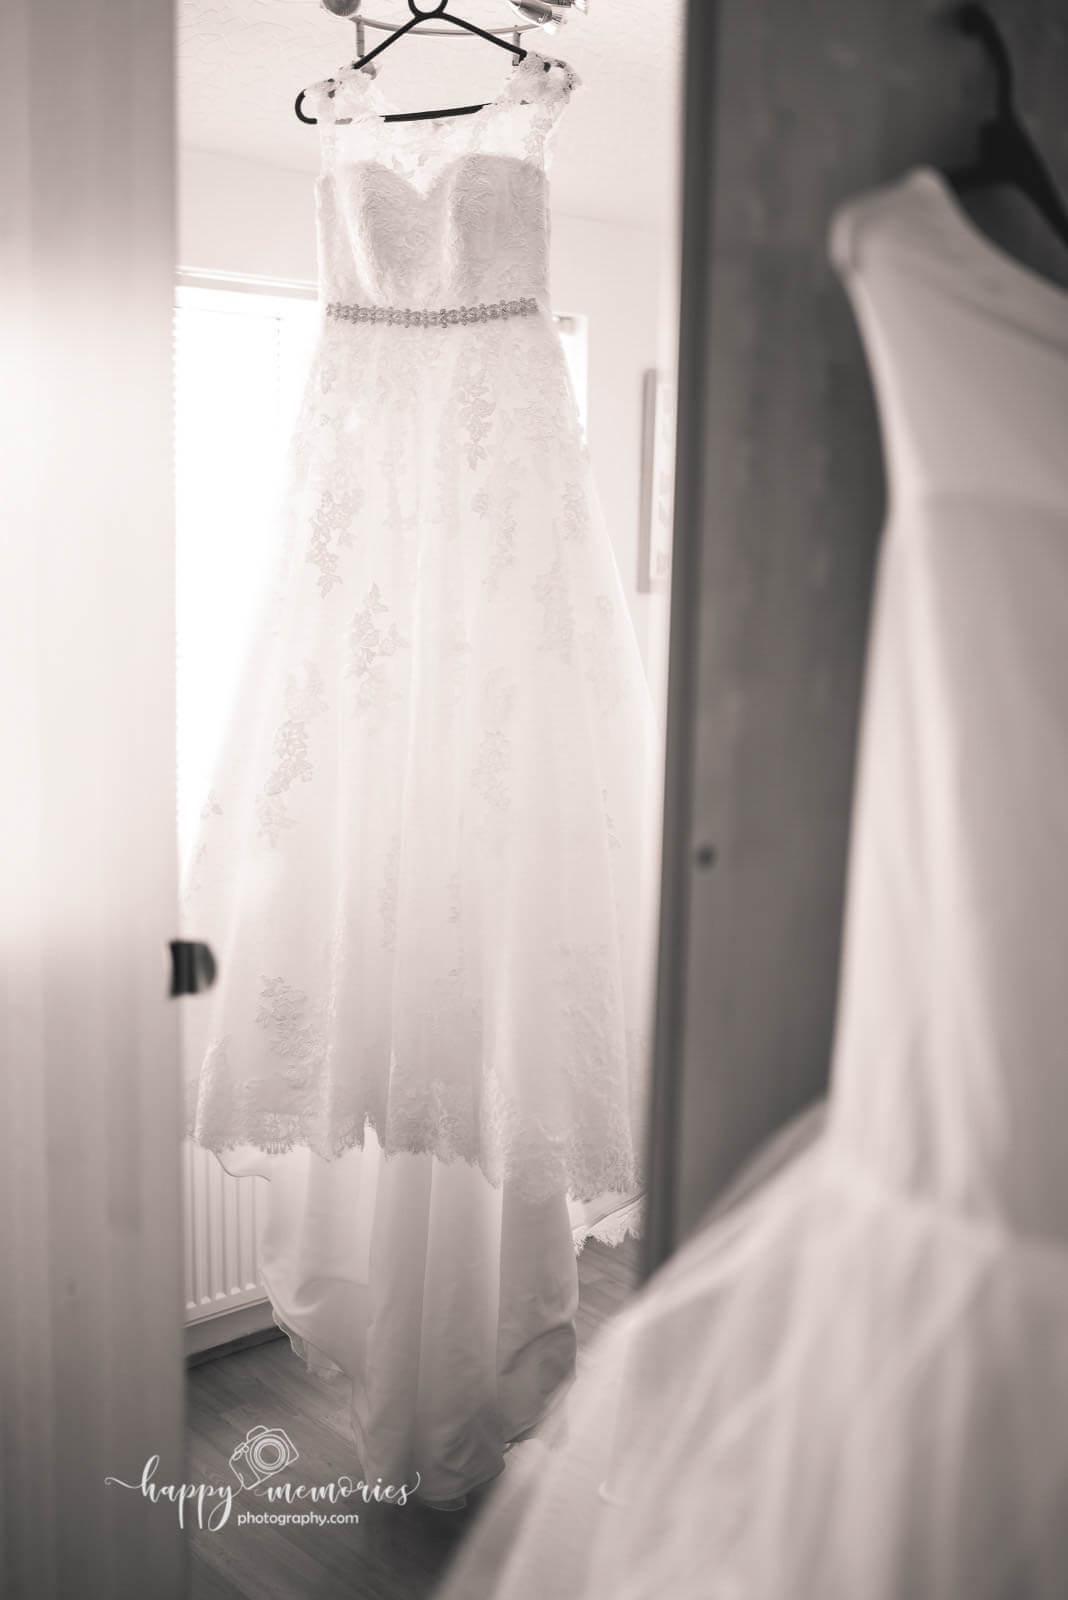 Wedding photographer East Grinstead-17